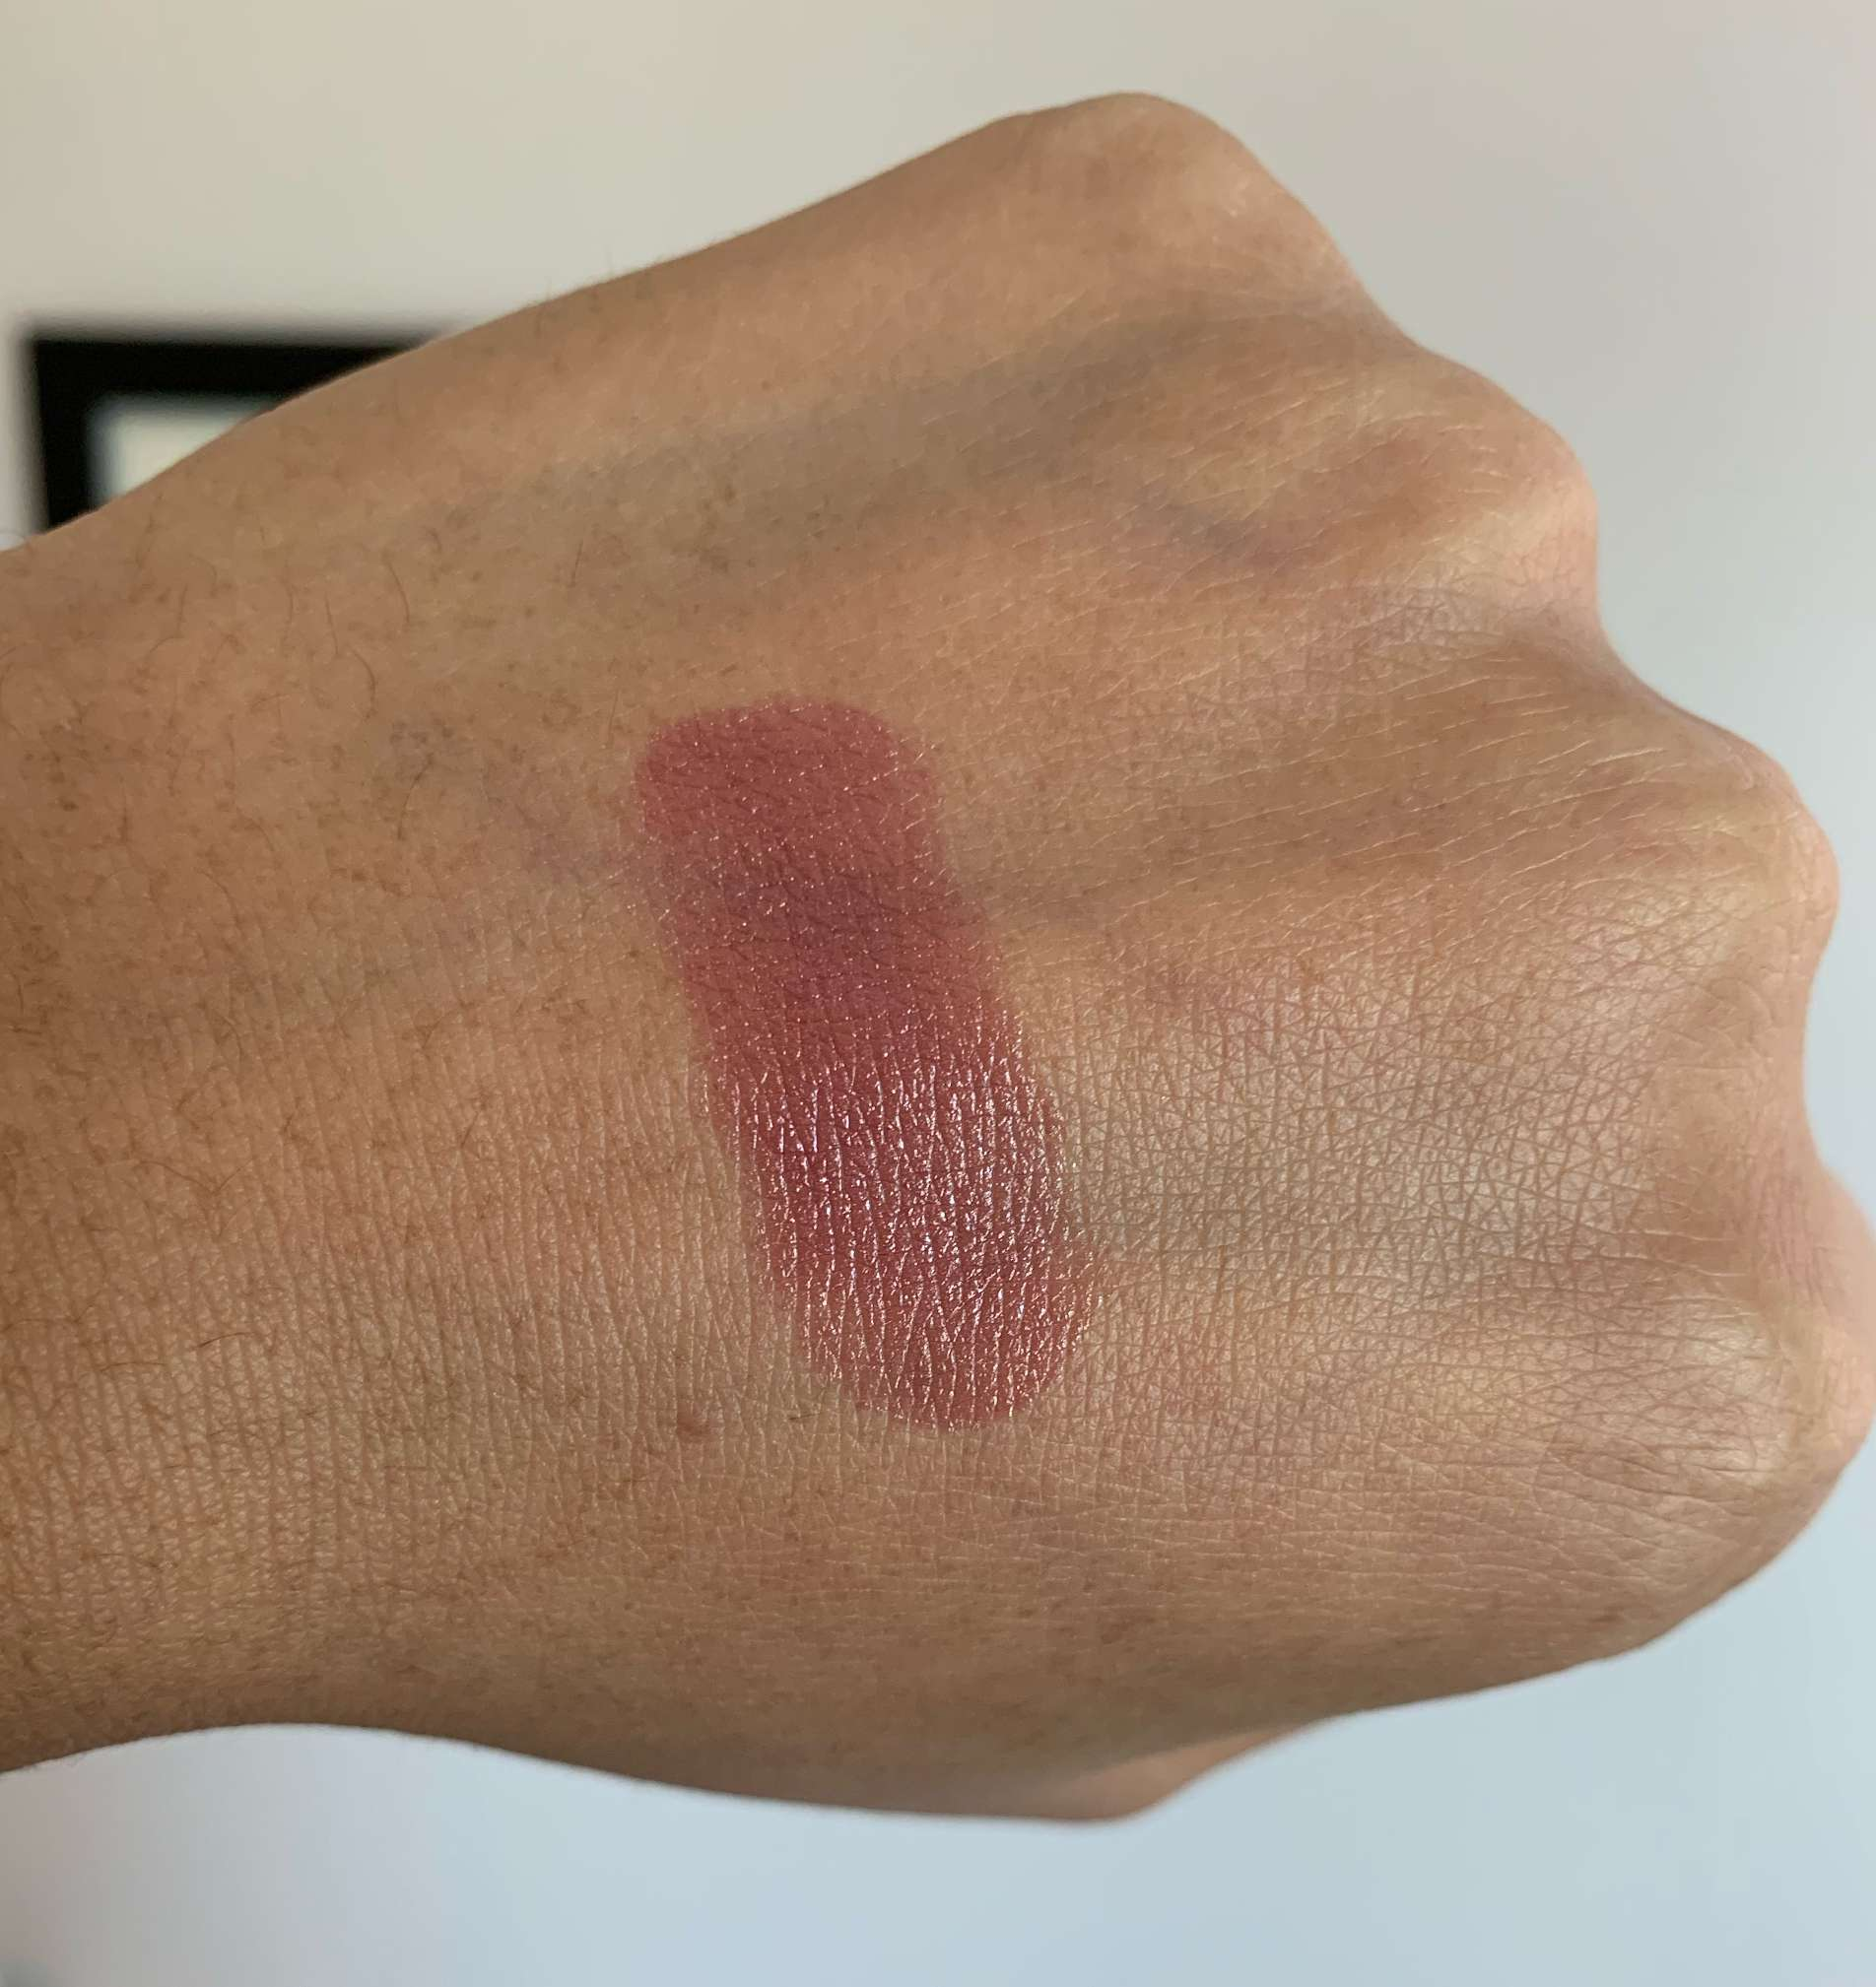 Chanel Rouge Coco Ultra Hydrating Lipstick 436 Maggy Swatch on Medium Dark Skin